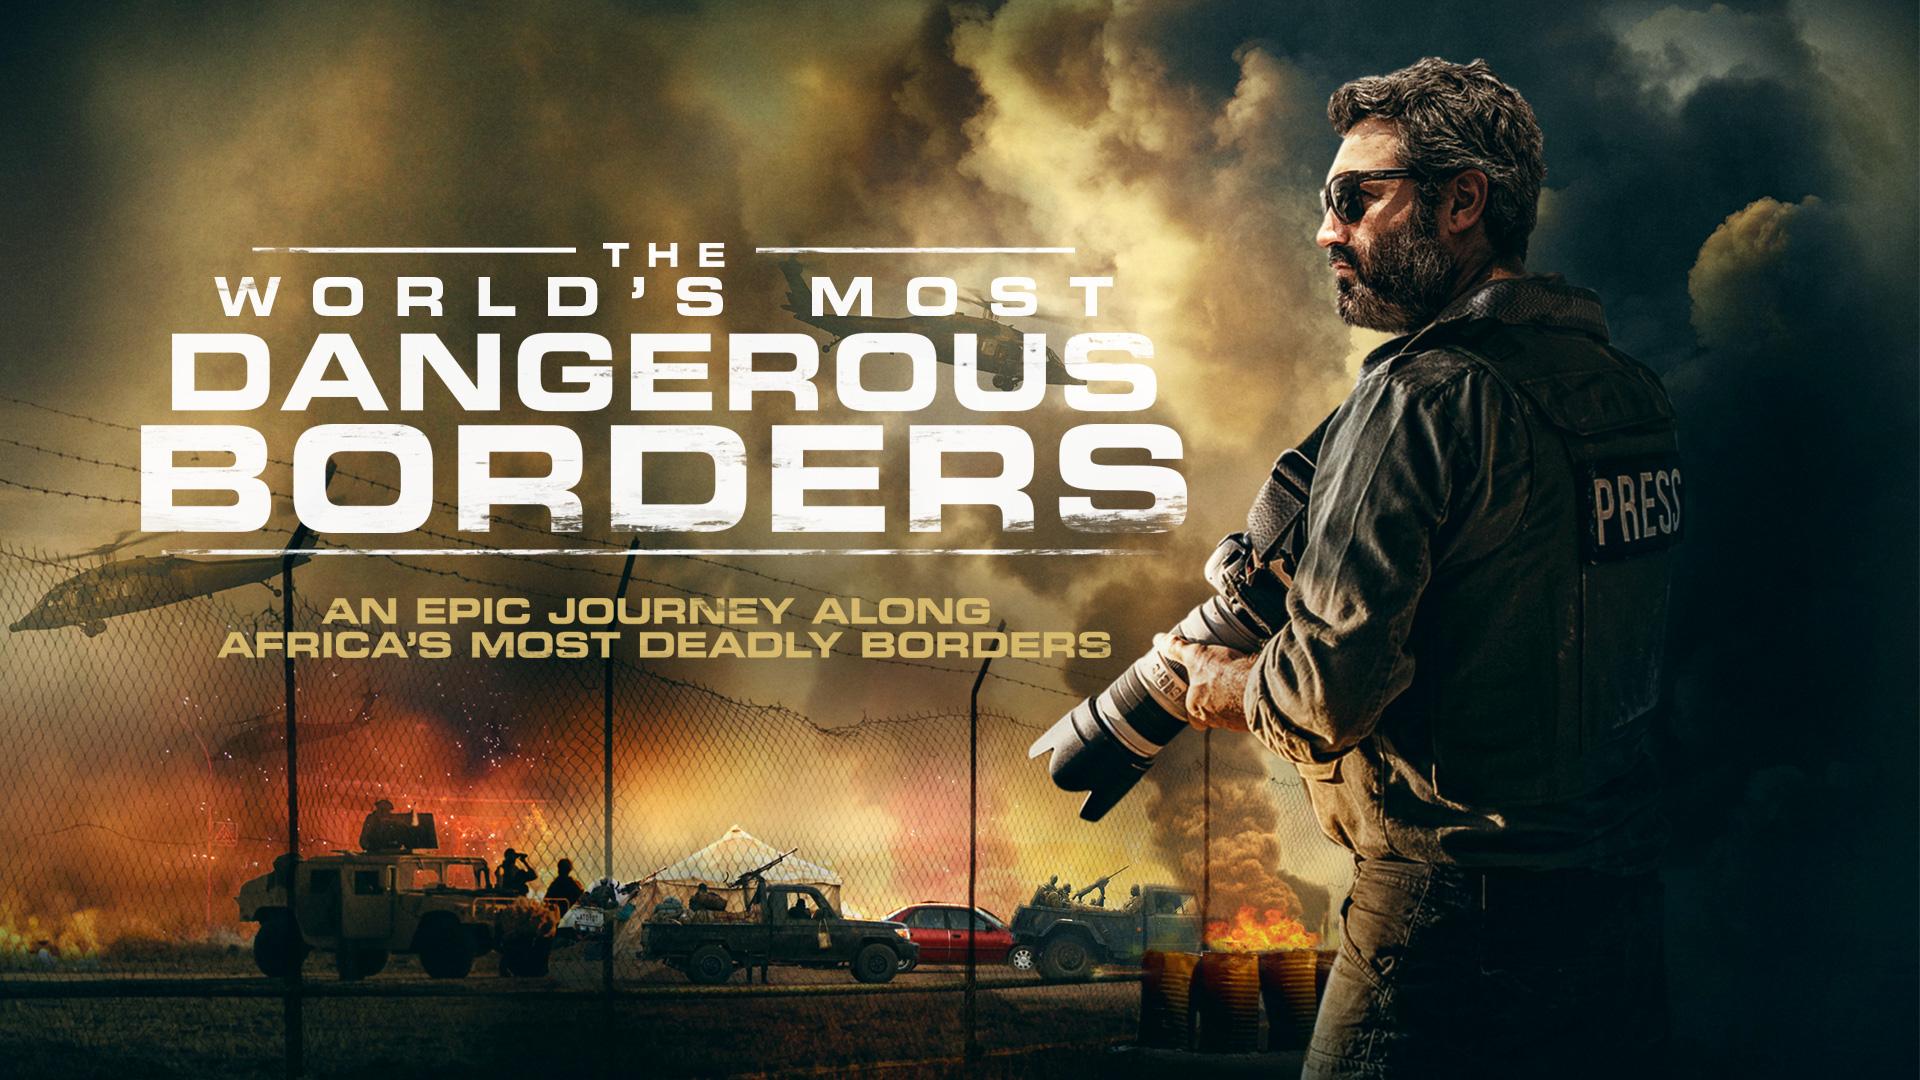 The World's Most Dangerous Borders